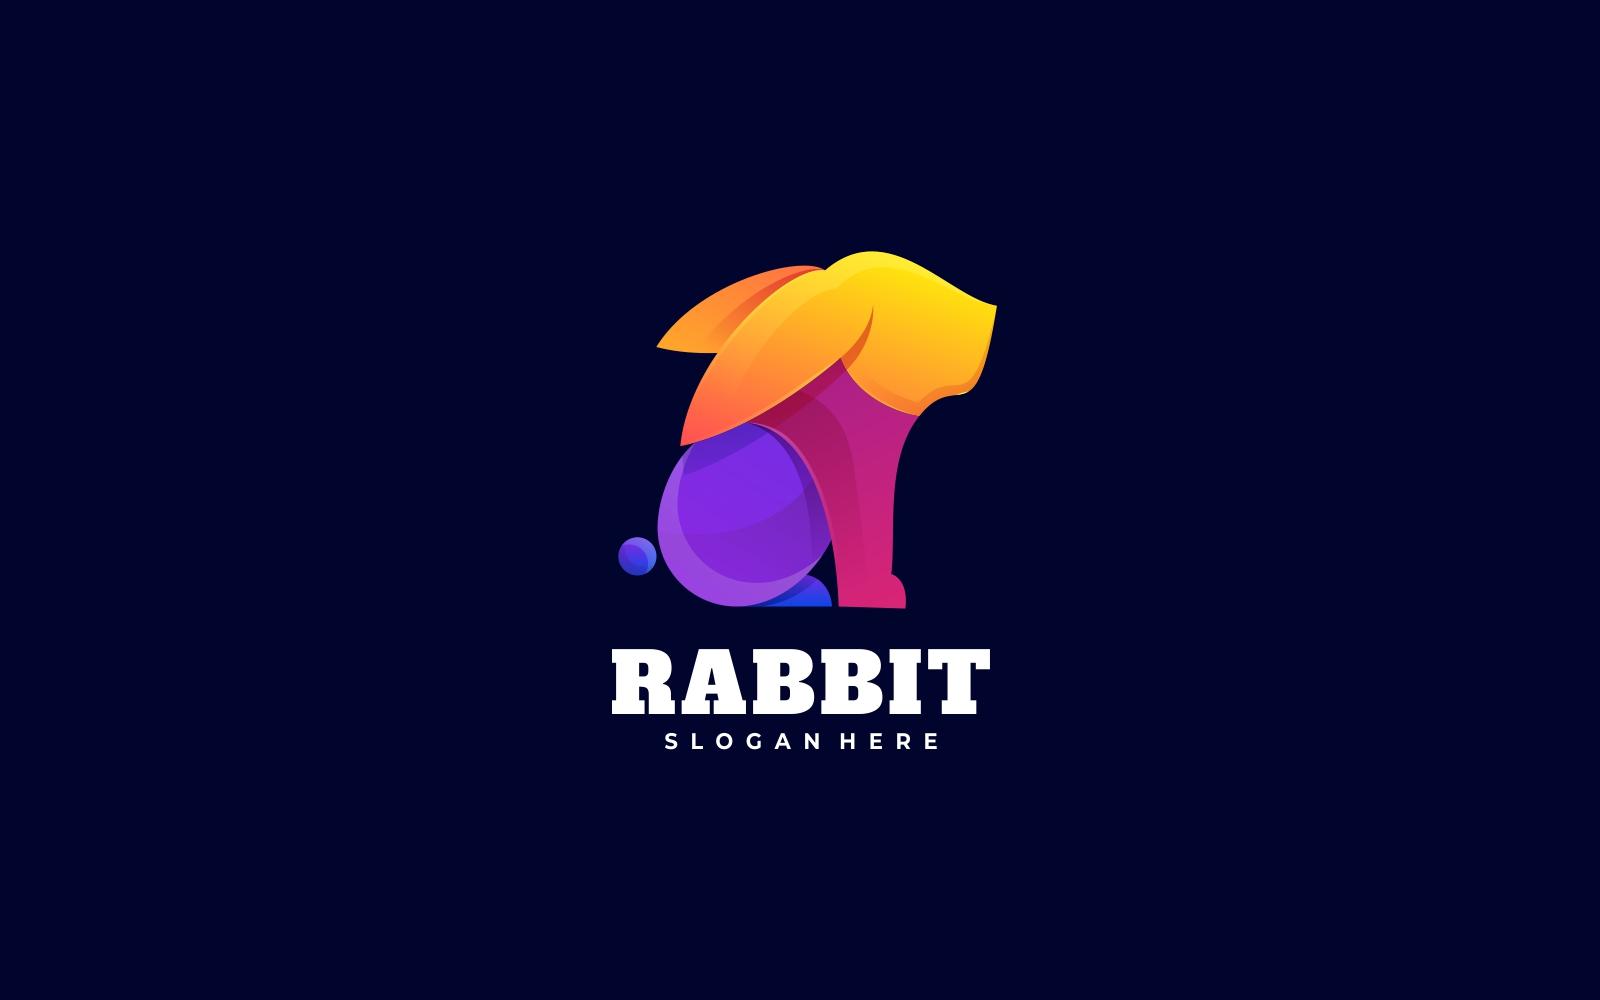 Rabbit Gradient Colorful Logo Style